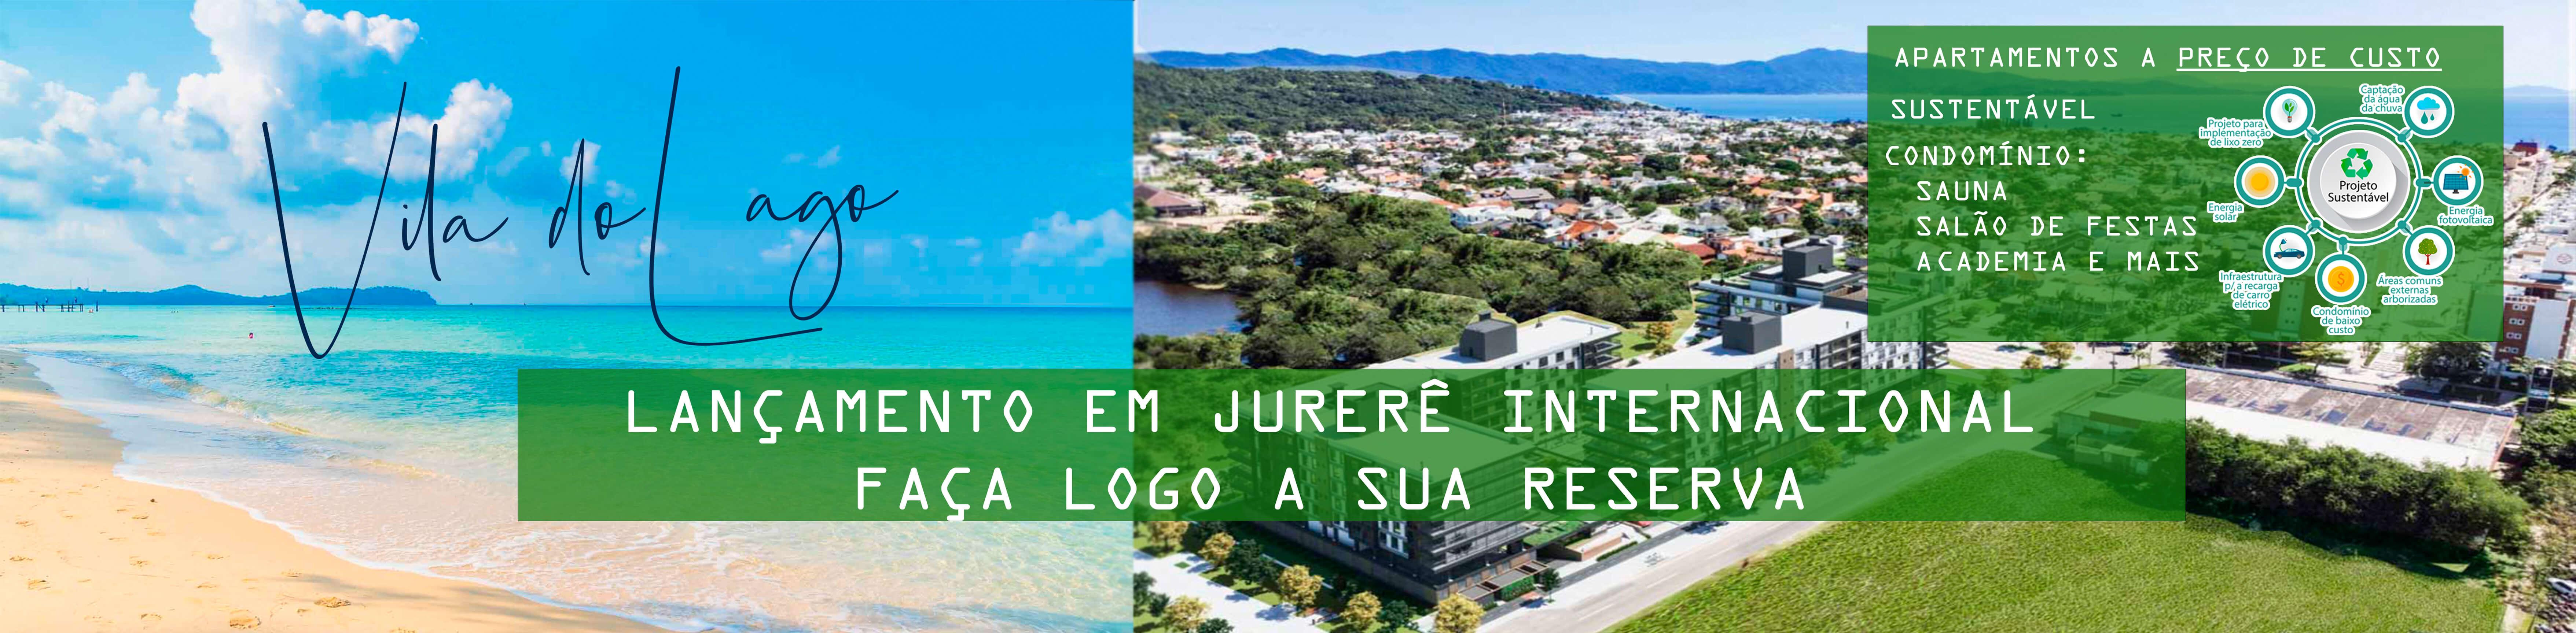 Vila do Lago